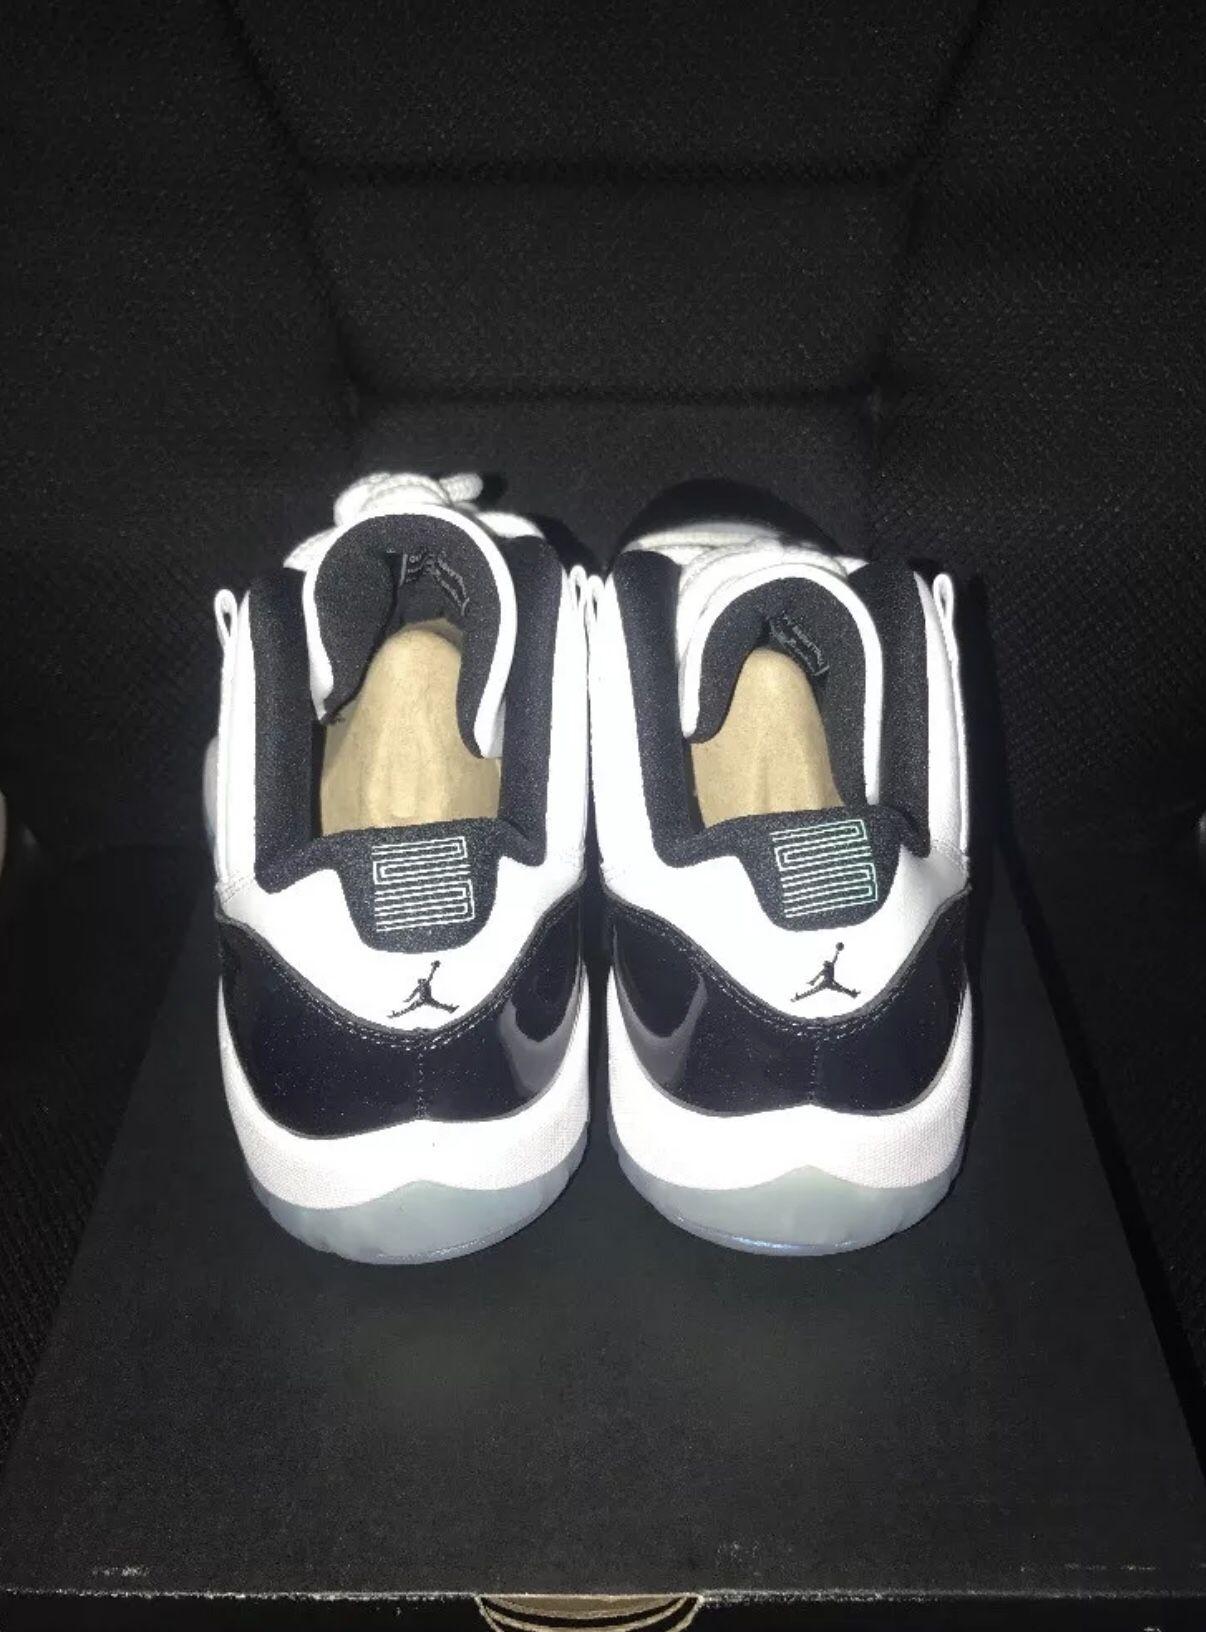 Jordan Retro 11 Low Easter in men's size 10 Brand New